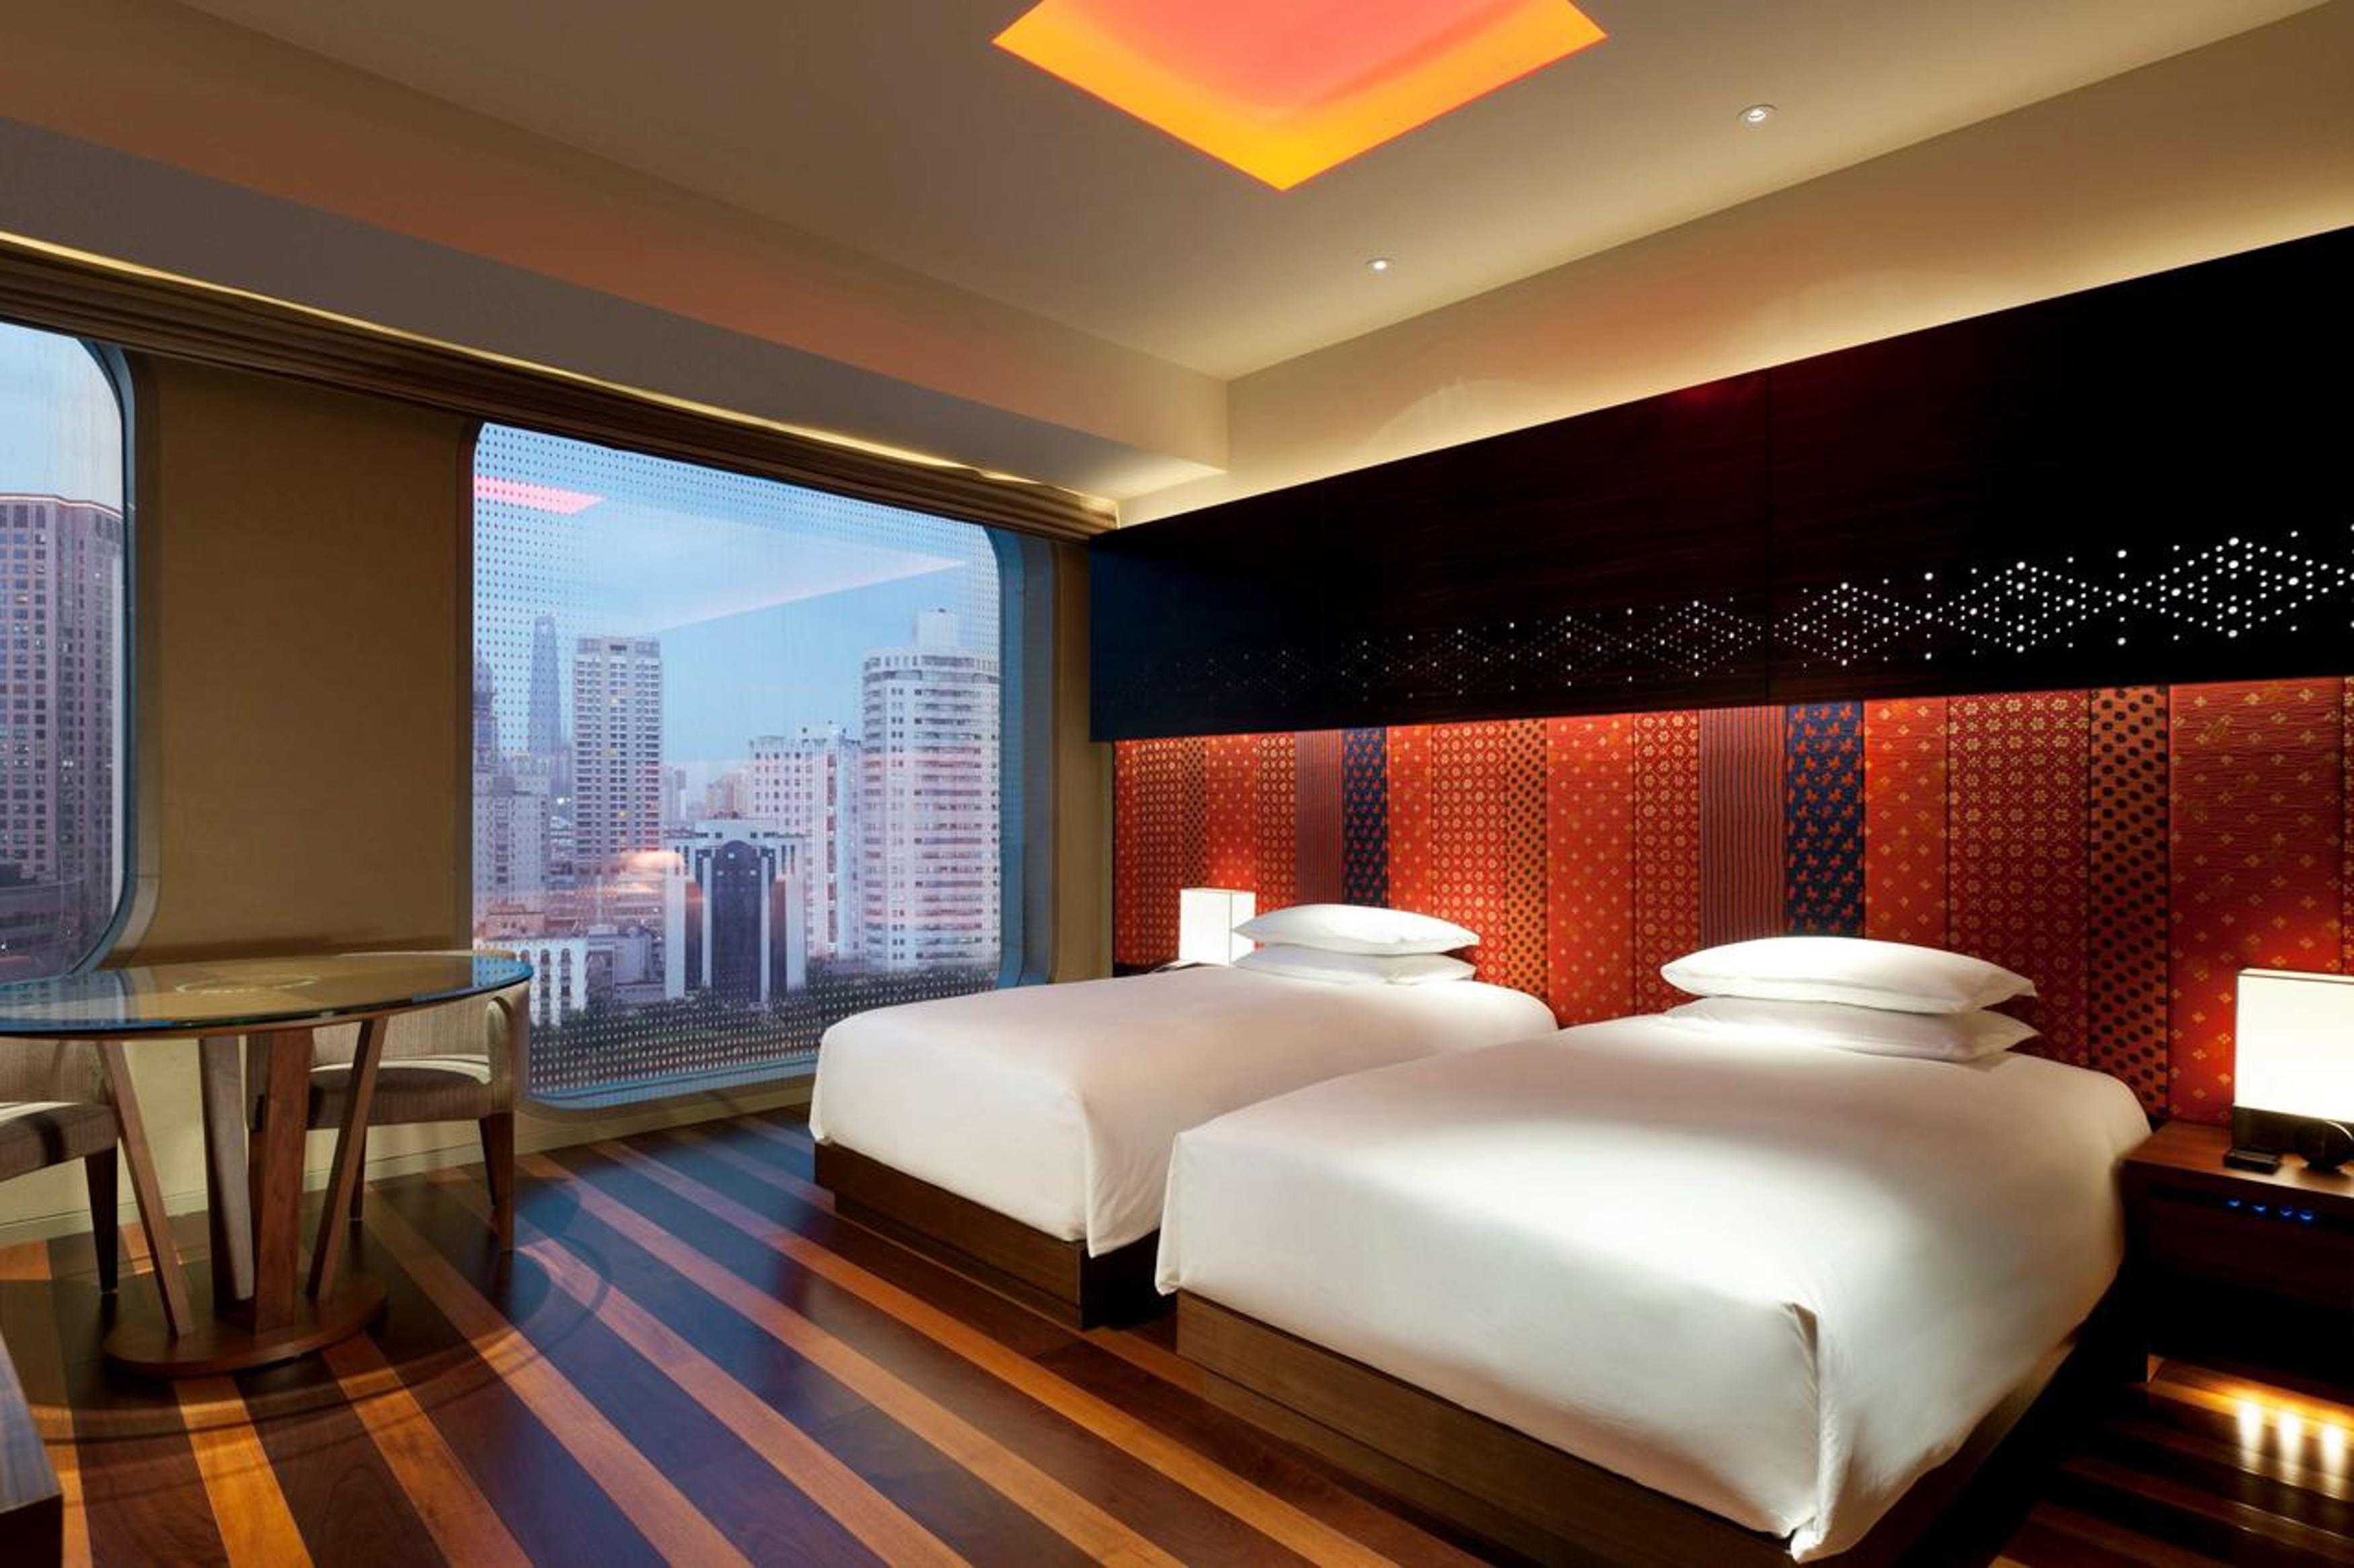 Shanghai Escorts, Escort Agencies And Erotic City Guide